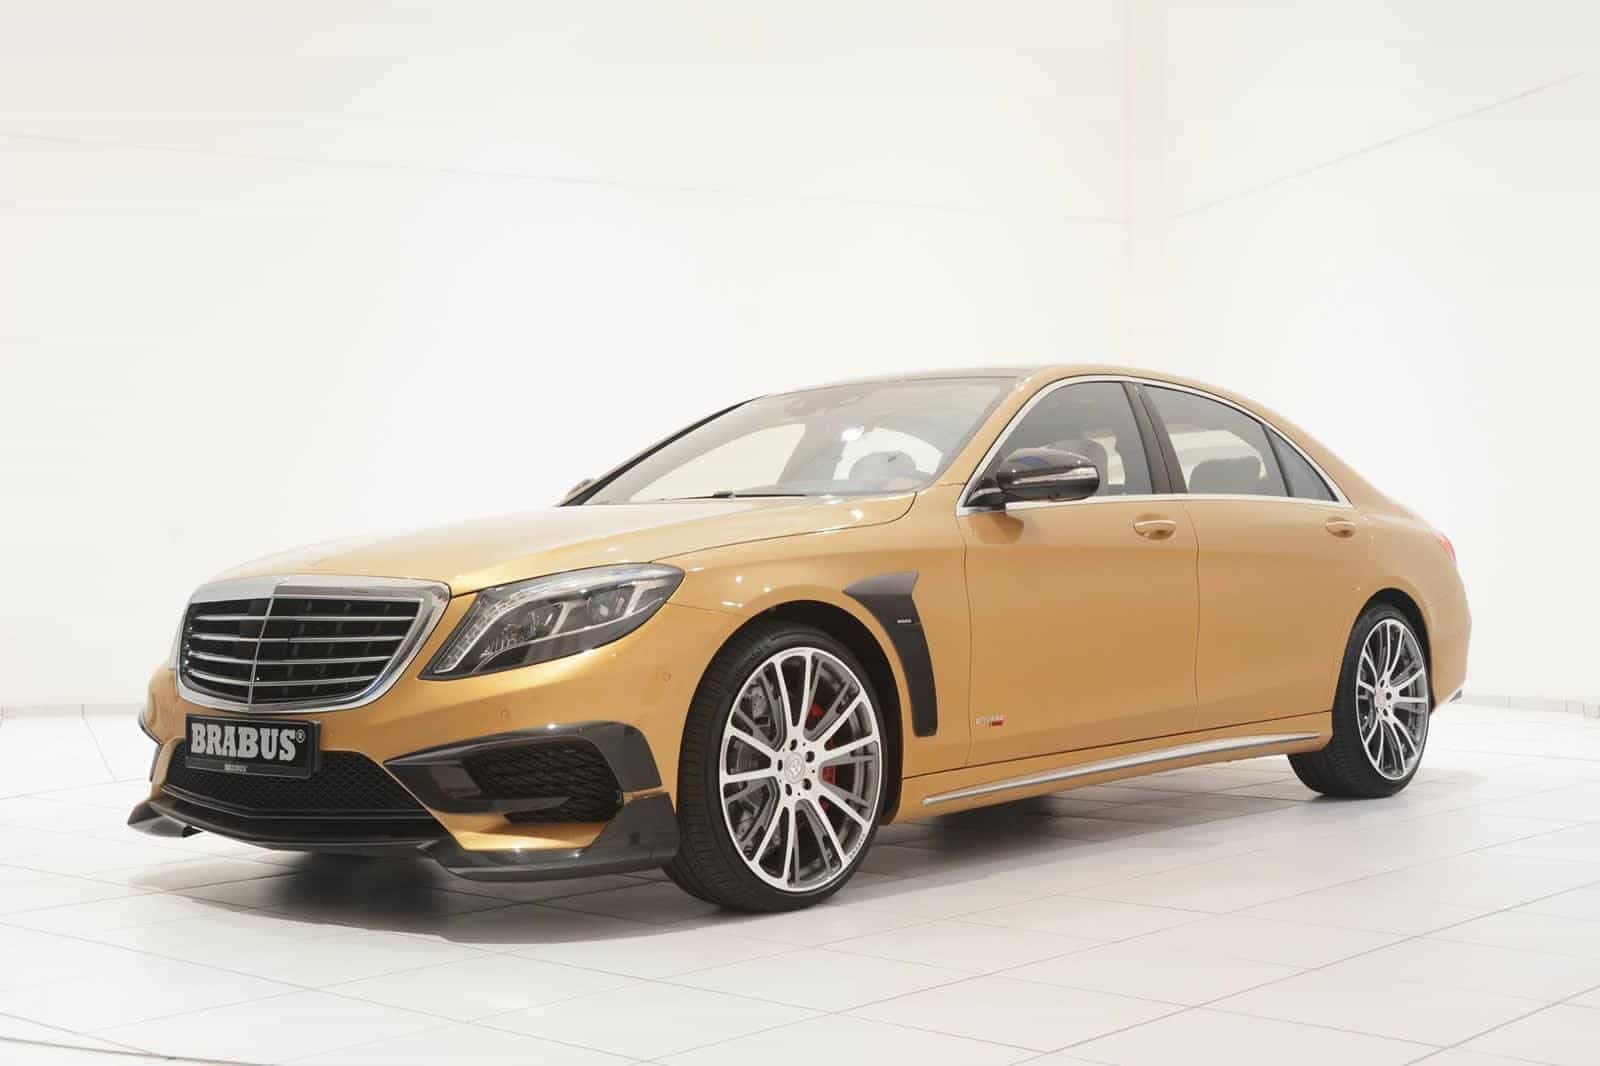 Brabus unveils new mercedes benz s63 amg modification for Mercedes benz modification